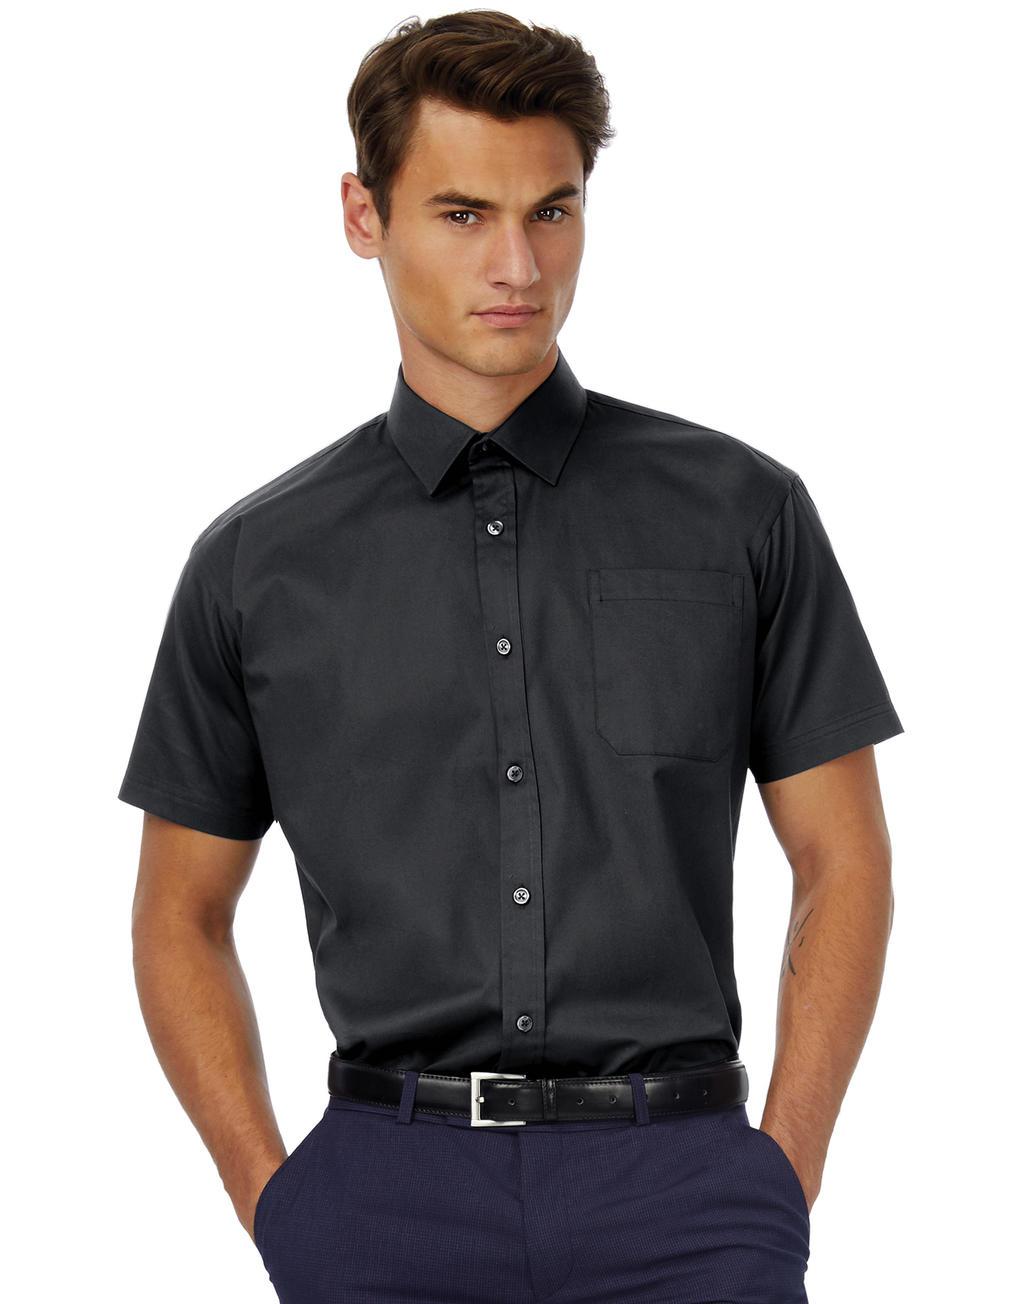 Koszula z krótkimi rękawami Sharp SSL/men Twill